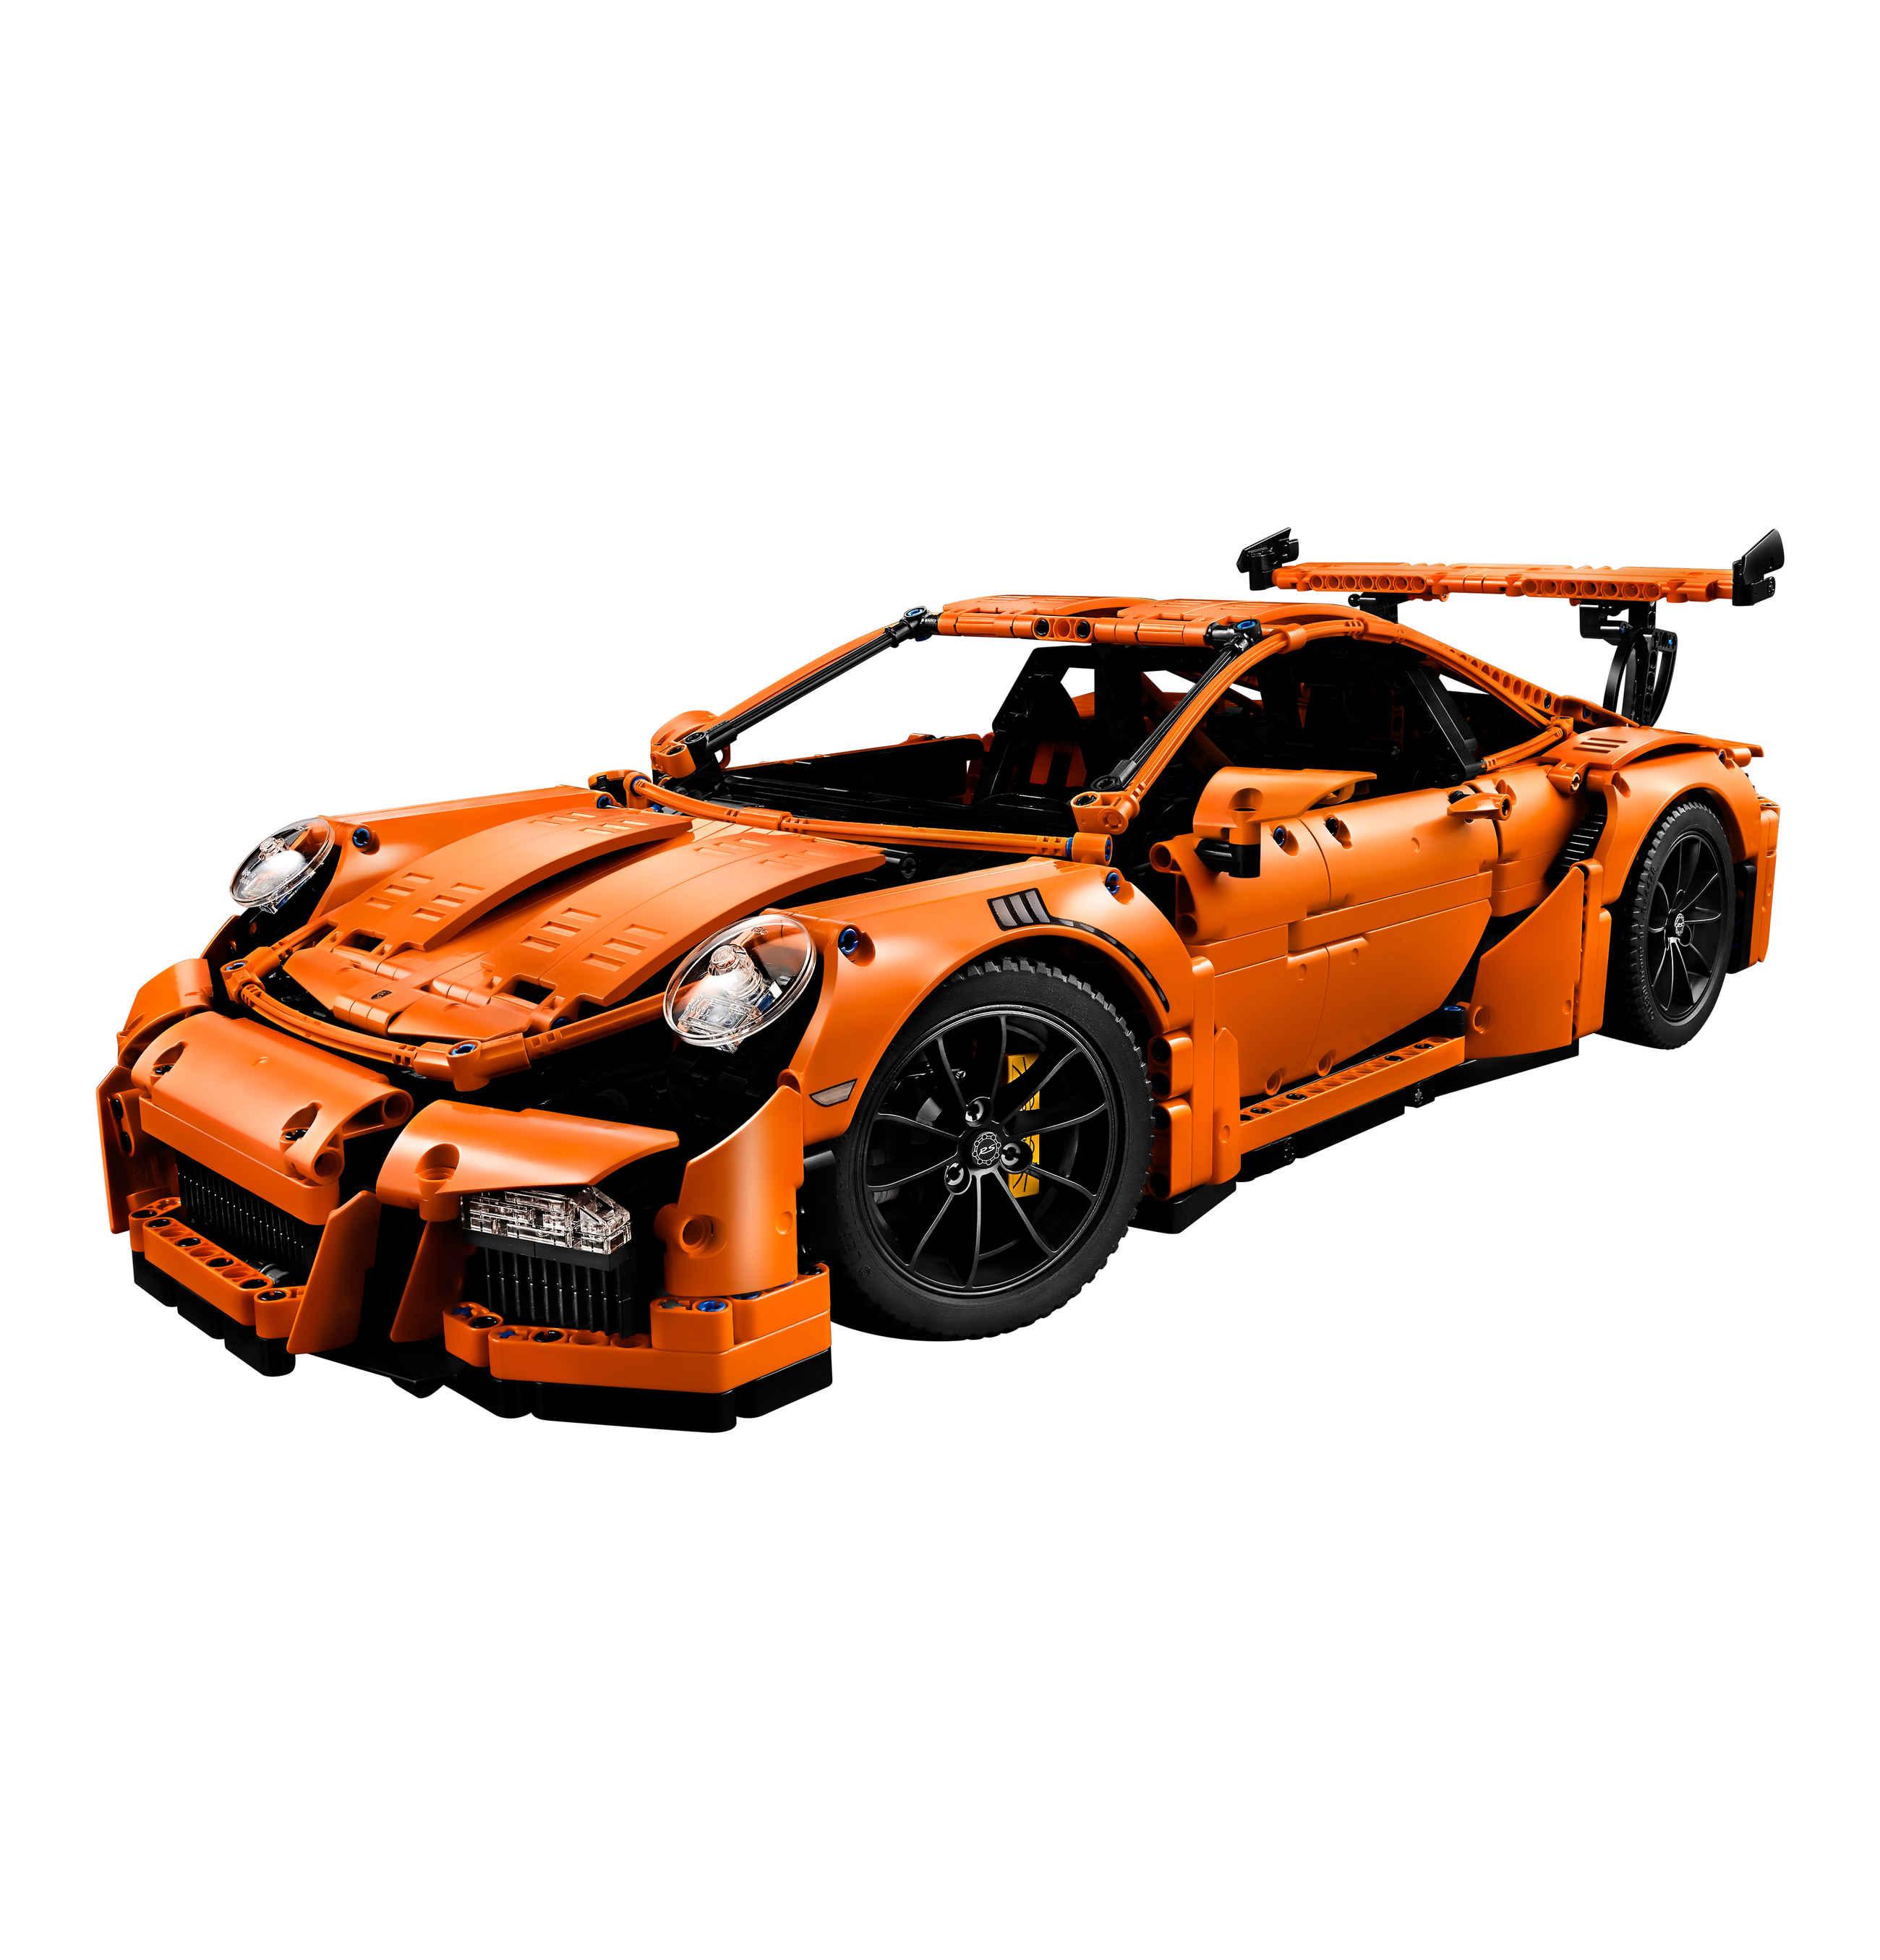 LEGO Technic 42056 Porsche 911 GT3 RS Elementoys